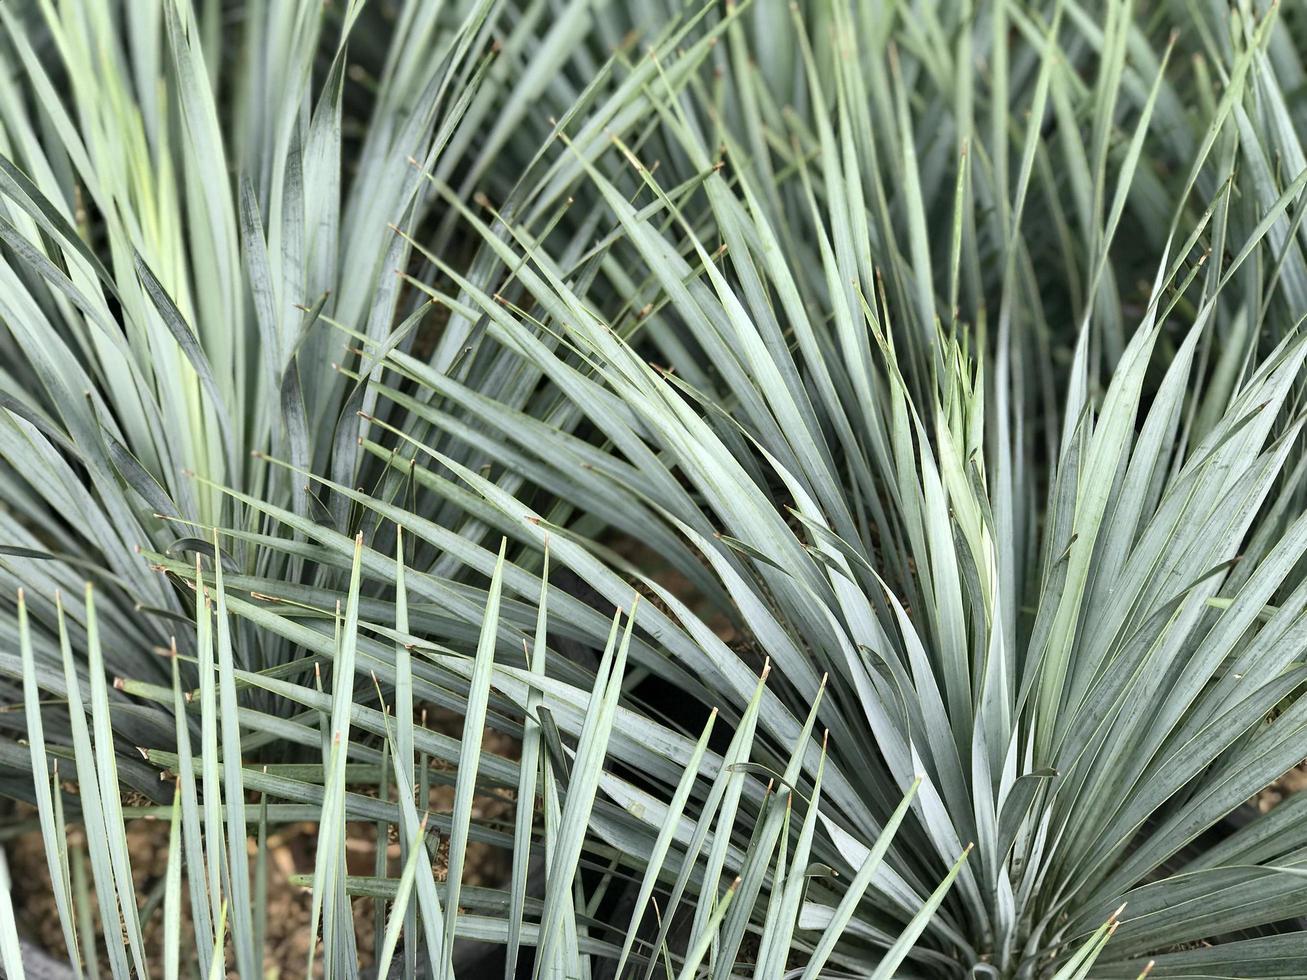 foglie taglienti di una palma foto